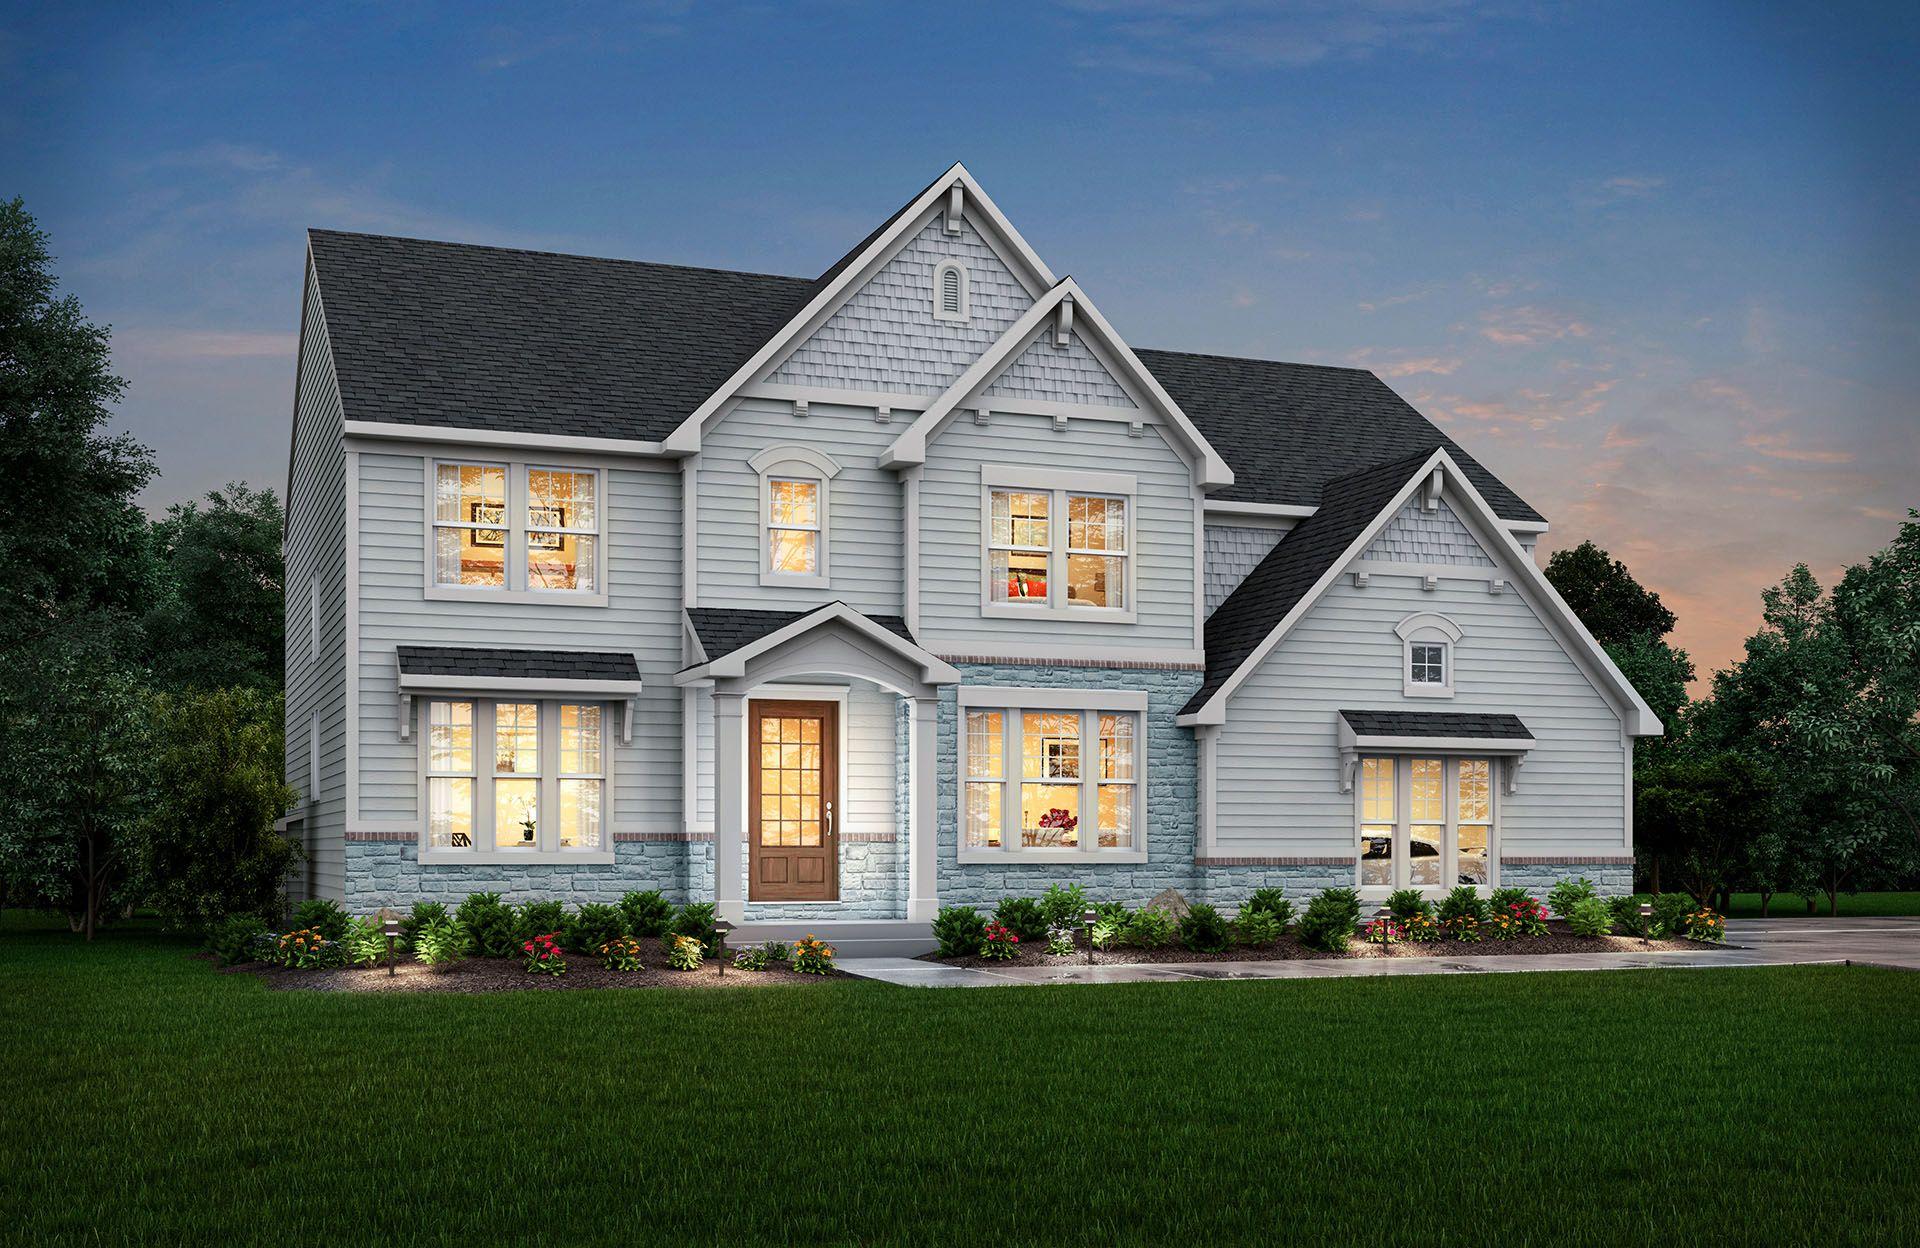 Single Family for Active at Oak Ridge At Tipton Lakes - Ash Lawn 4950 Carr Hill Road Columbus, Indiana 47201 United States